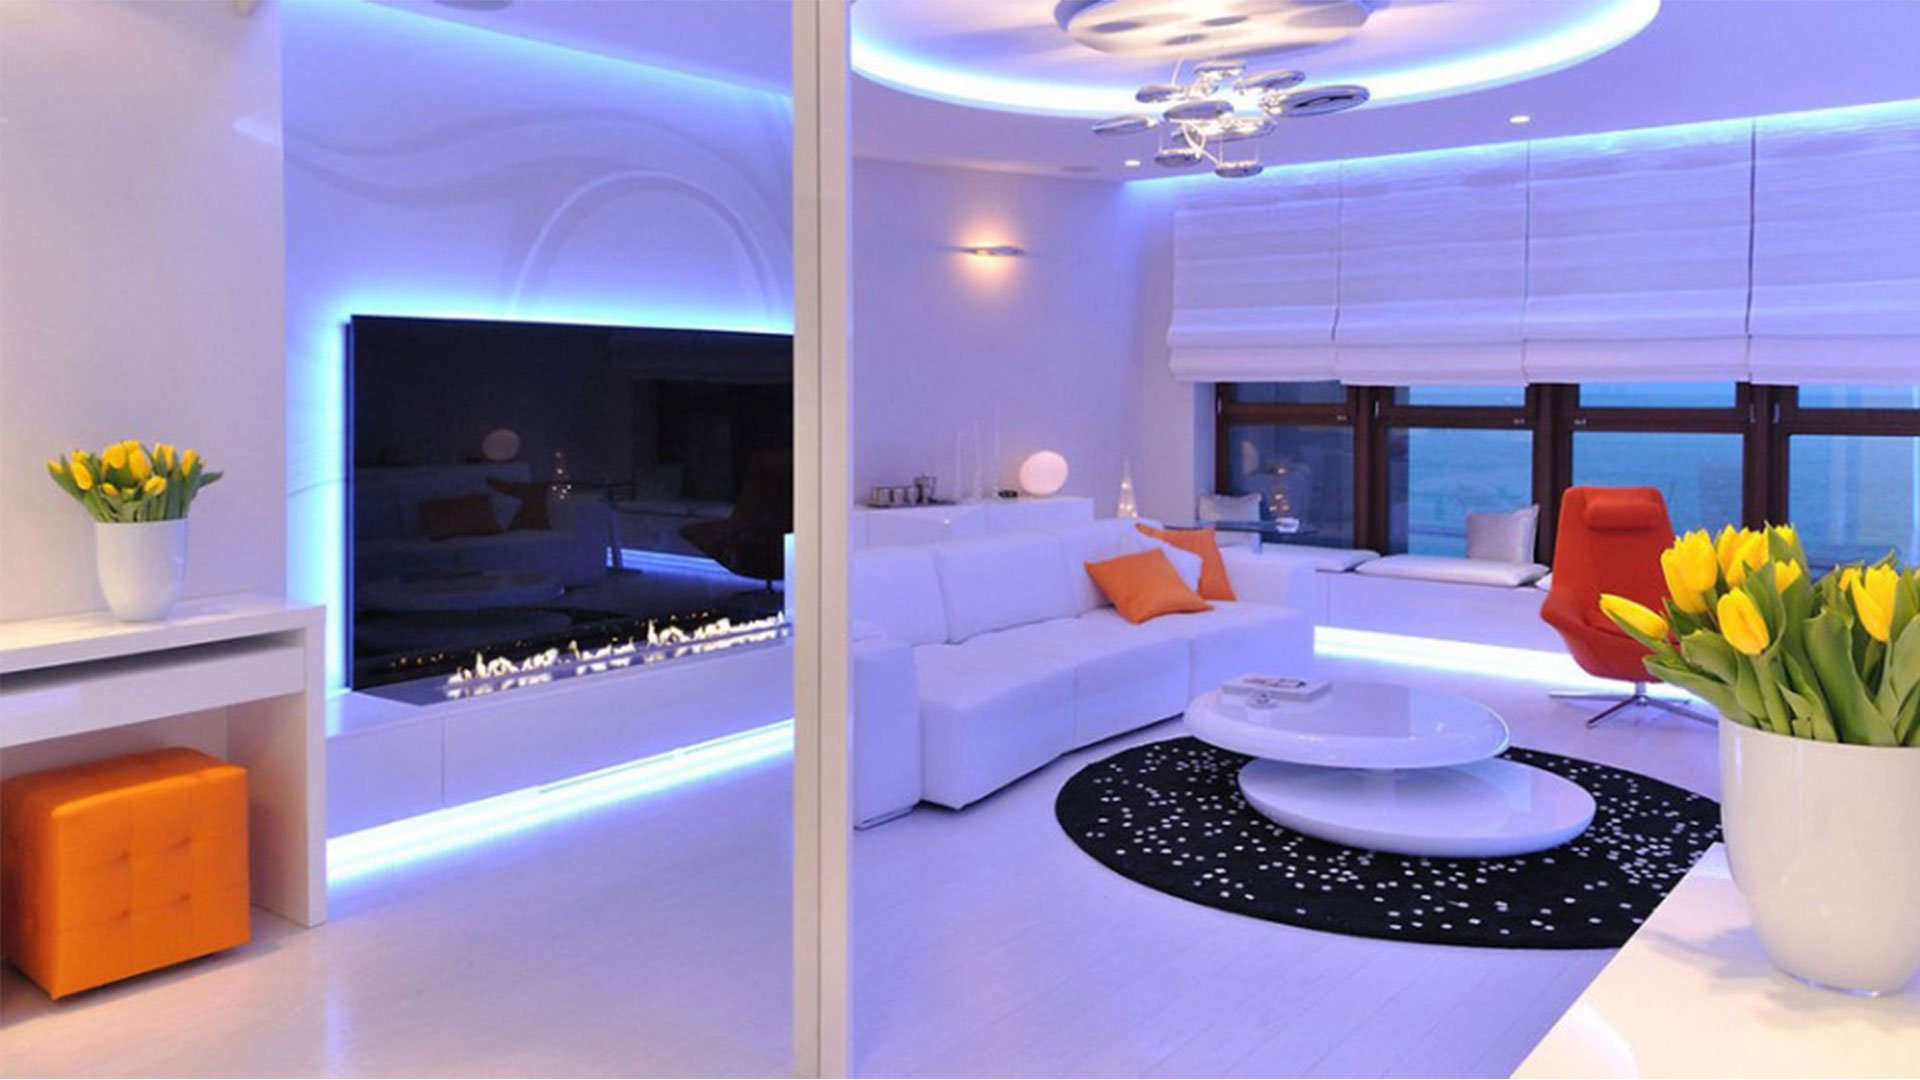 Interior Design Purple Living Room Interior Design Room House Home Apartment Condo 251 Wallpaper